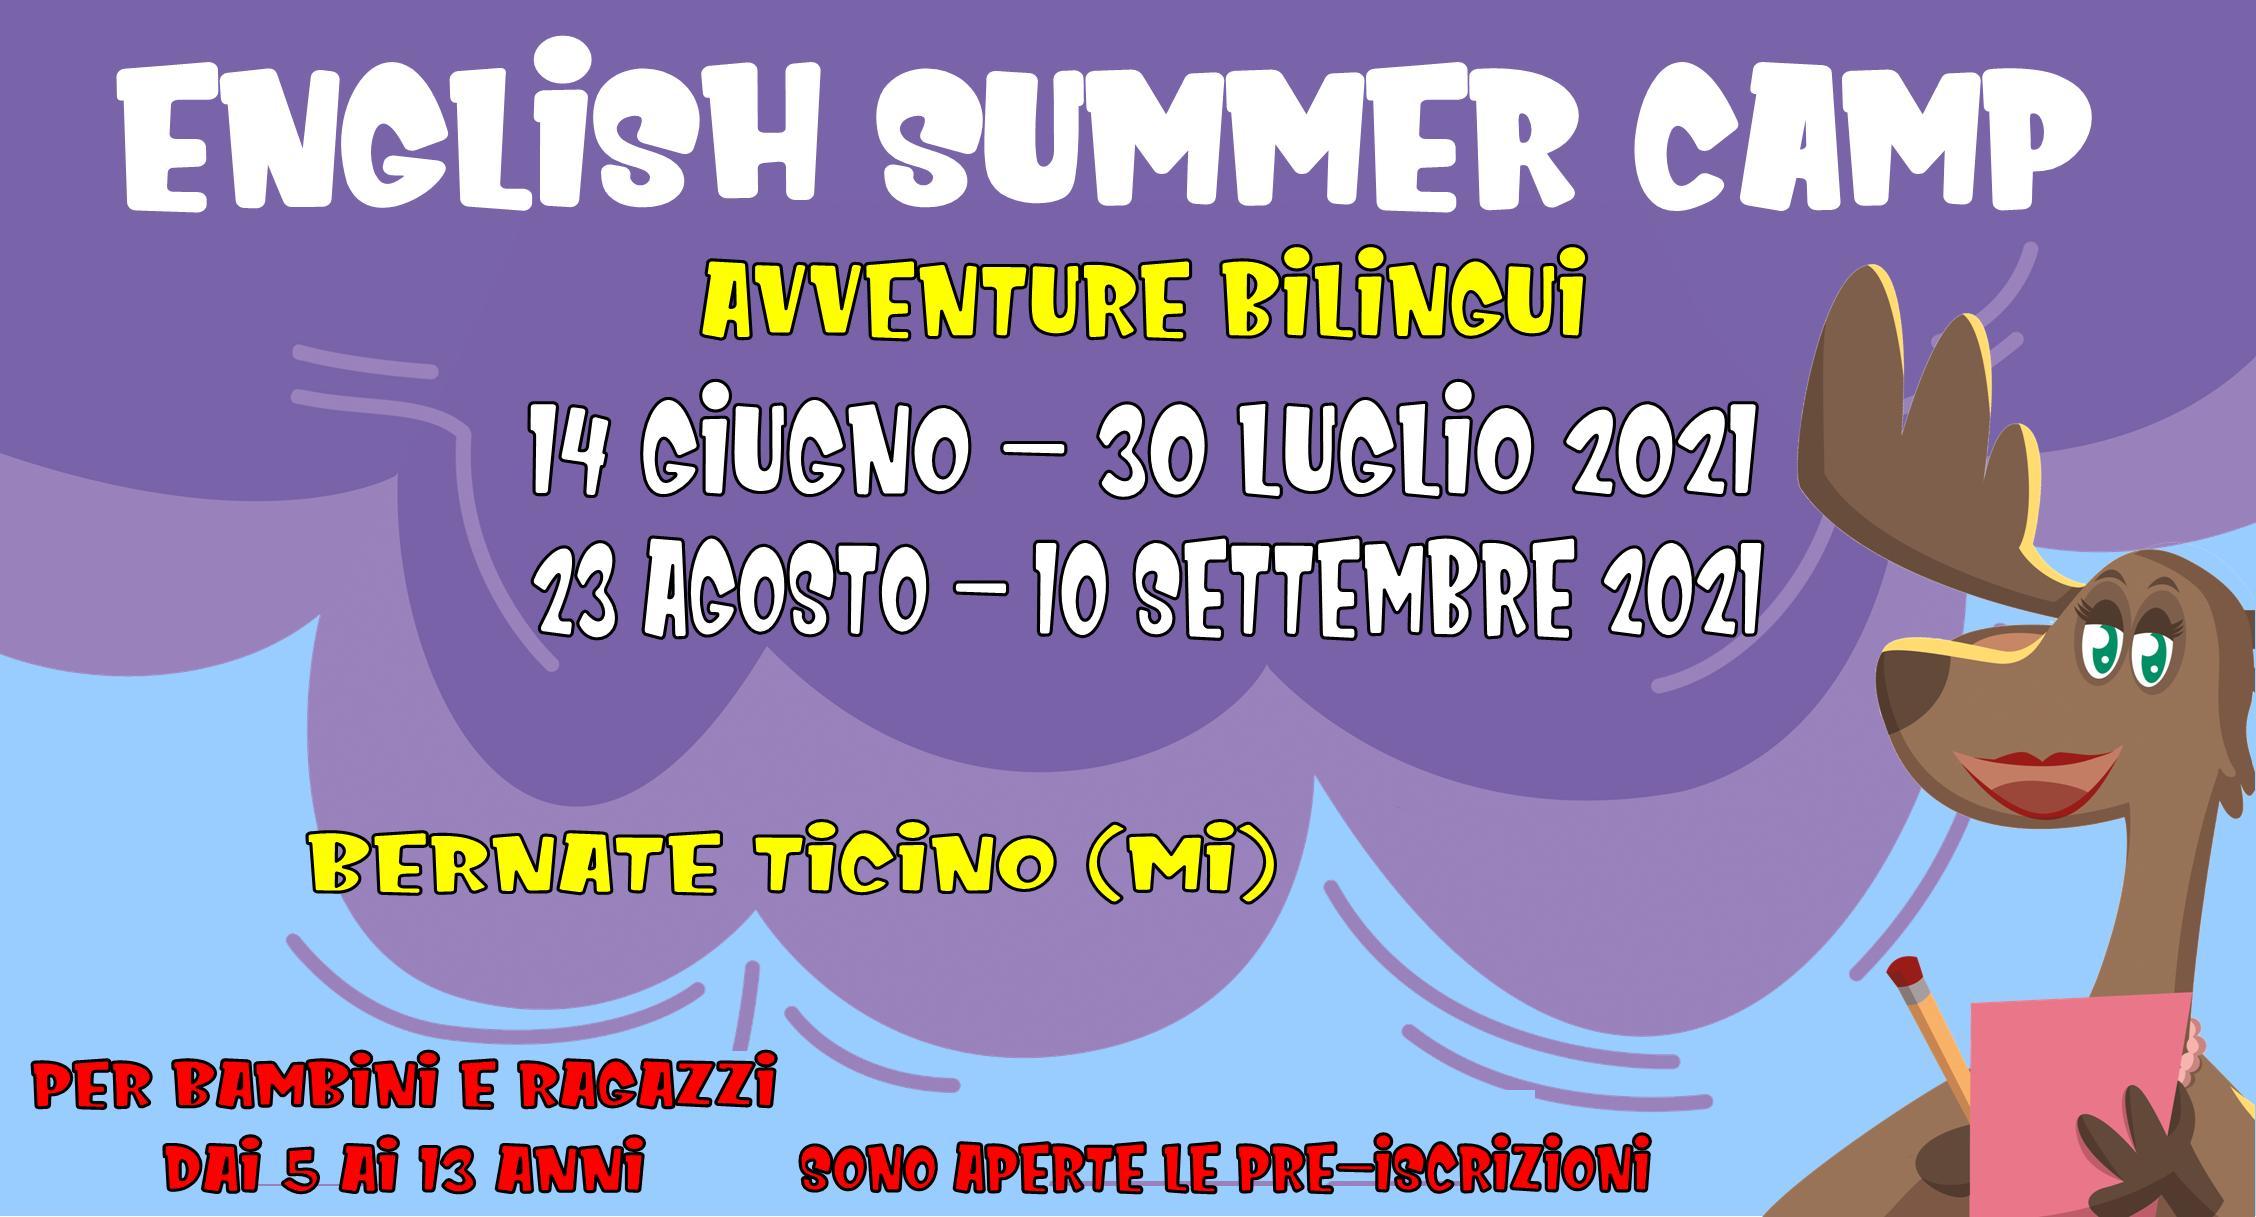 Mini locandina English Summer Camp